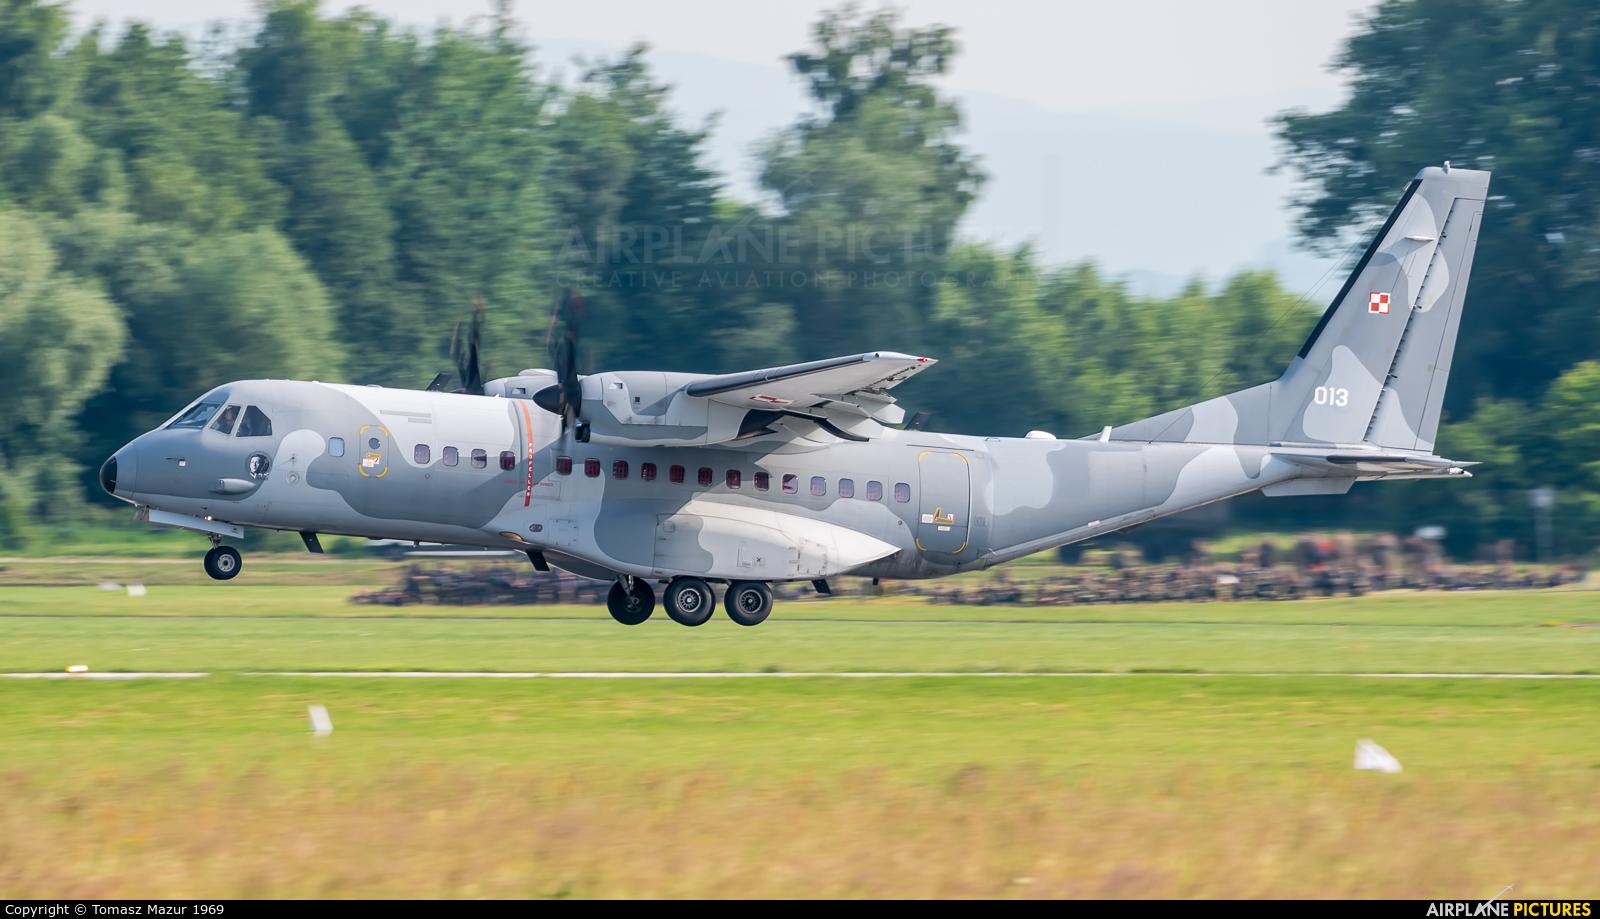 Poland - Air Force 013 aircraft at Kraków - John Paul II Intl